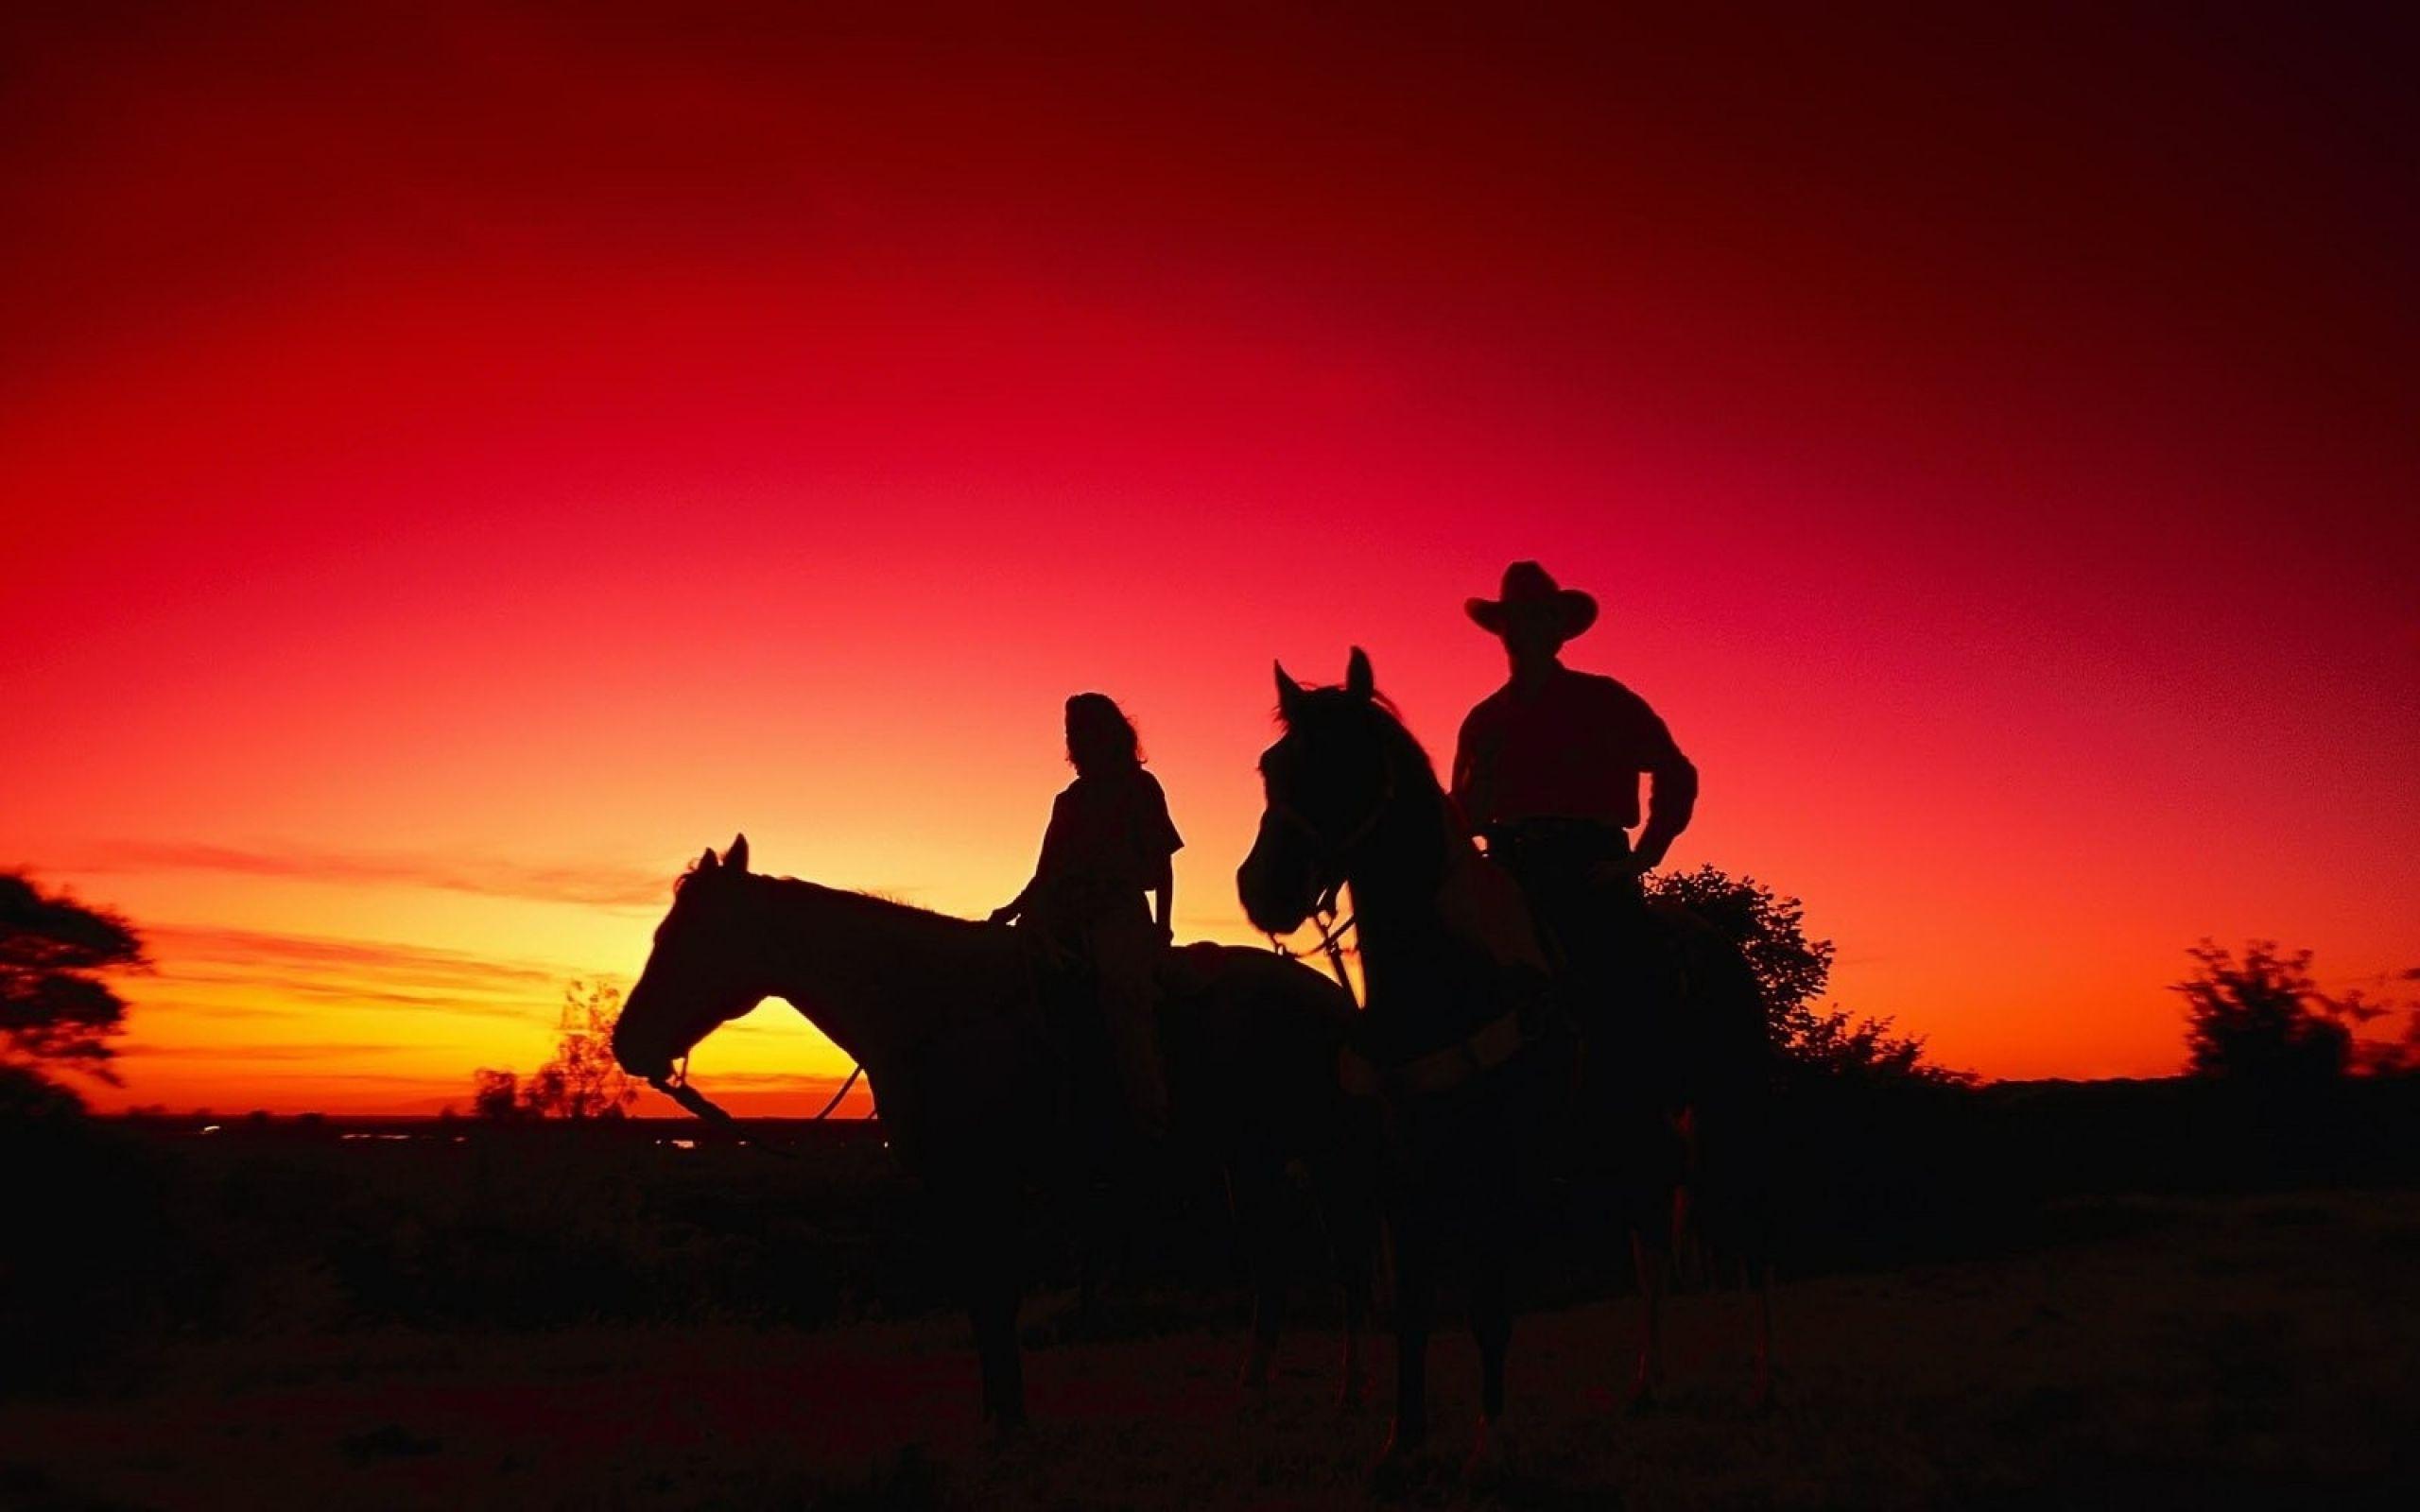 Download Wallpapers Download 2560x1600 Cowboys Western 1600x1200 Wallpaper People Hd Wallpaper Hi Res People Wallpaper High Vida De Bombeiro Bombeiro Cavalos